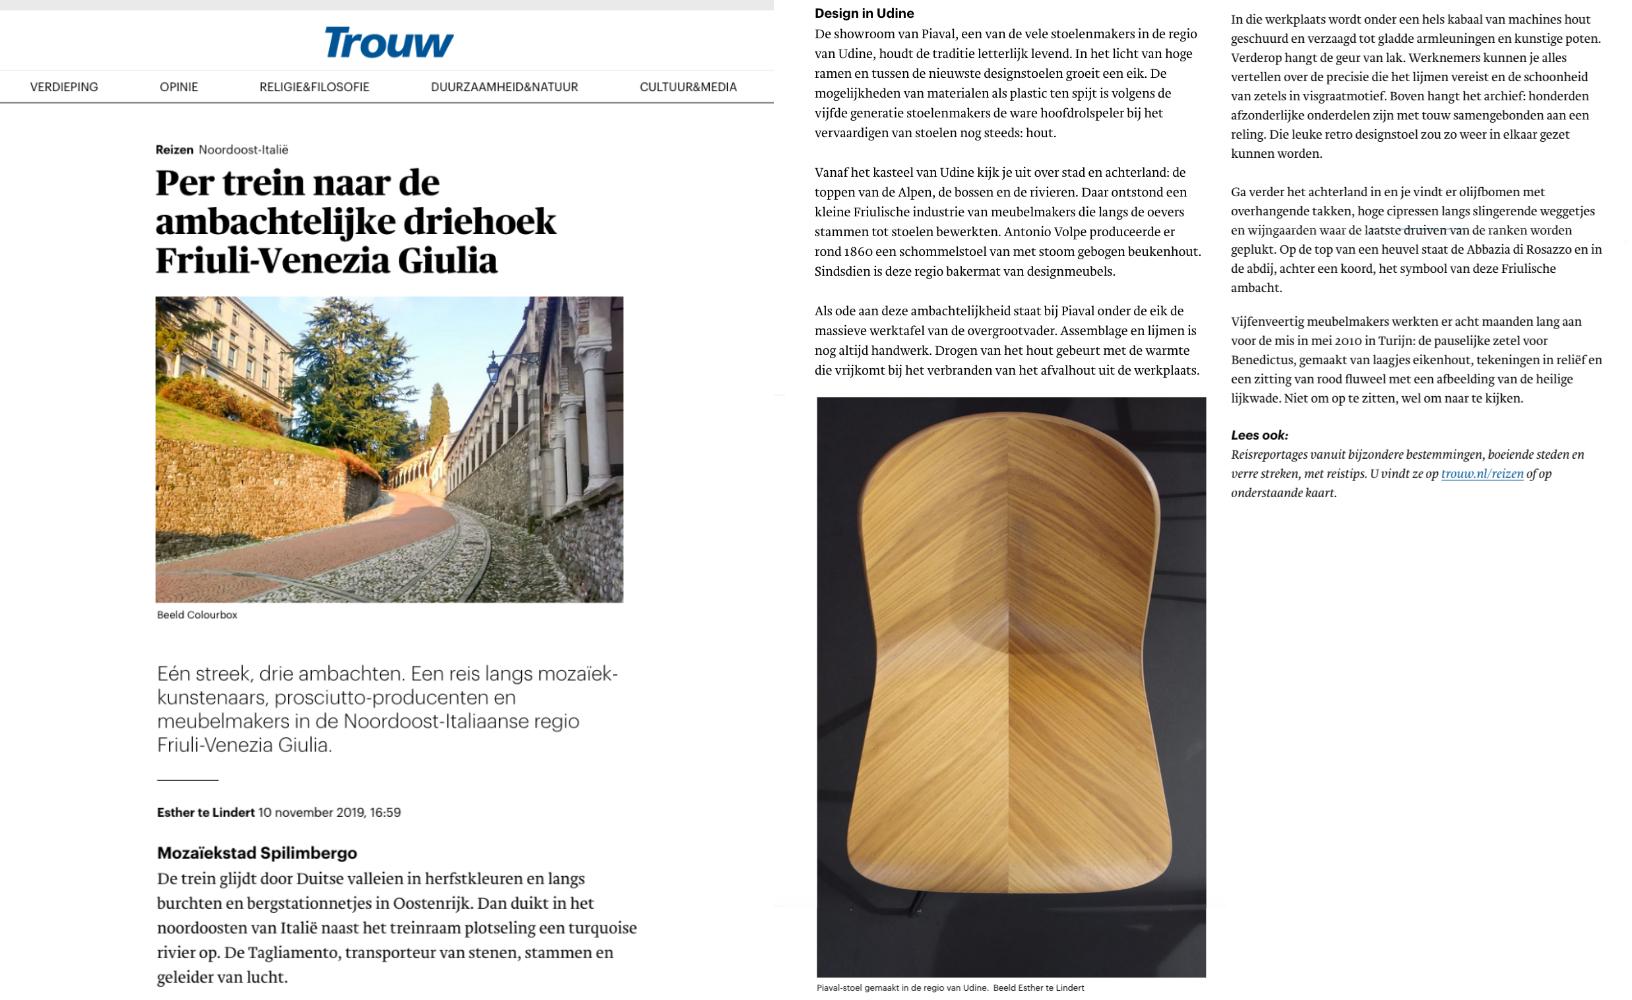 Herringbone chair on Trouw magazine